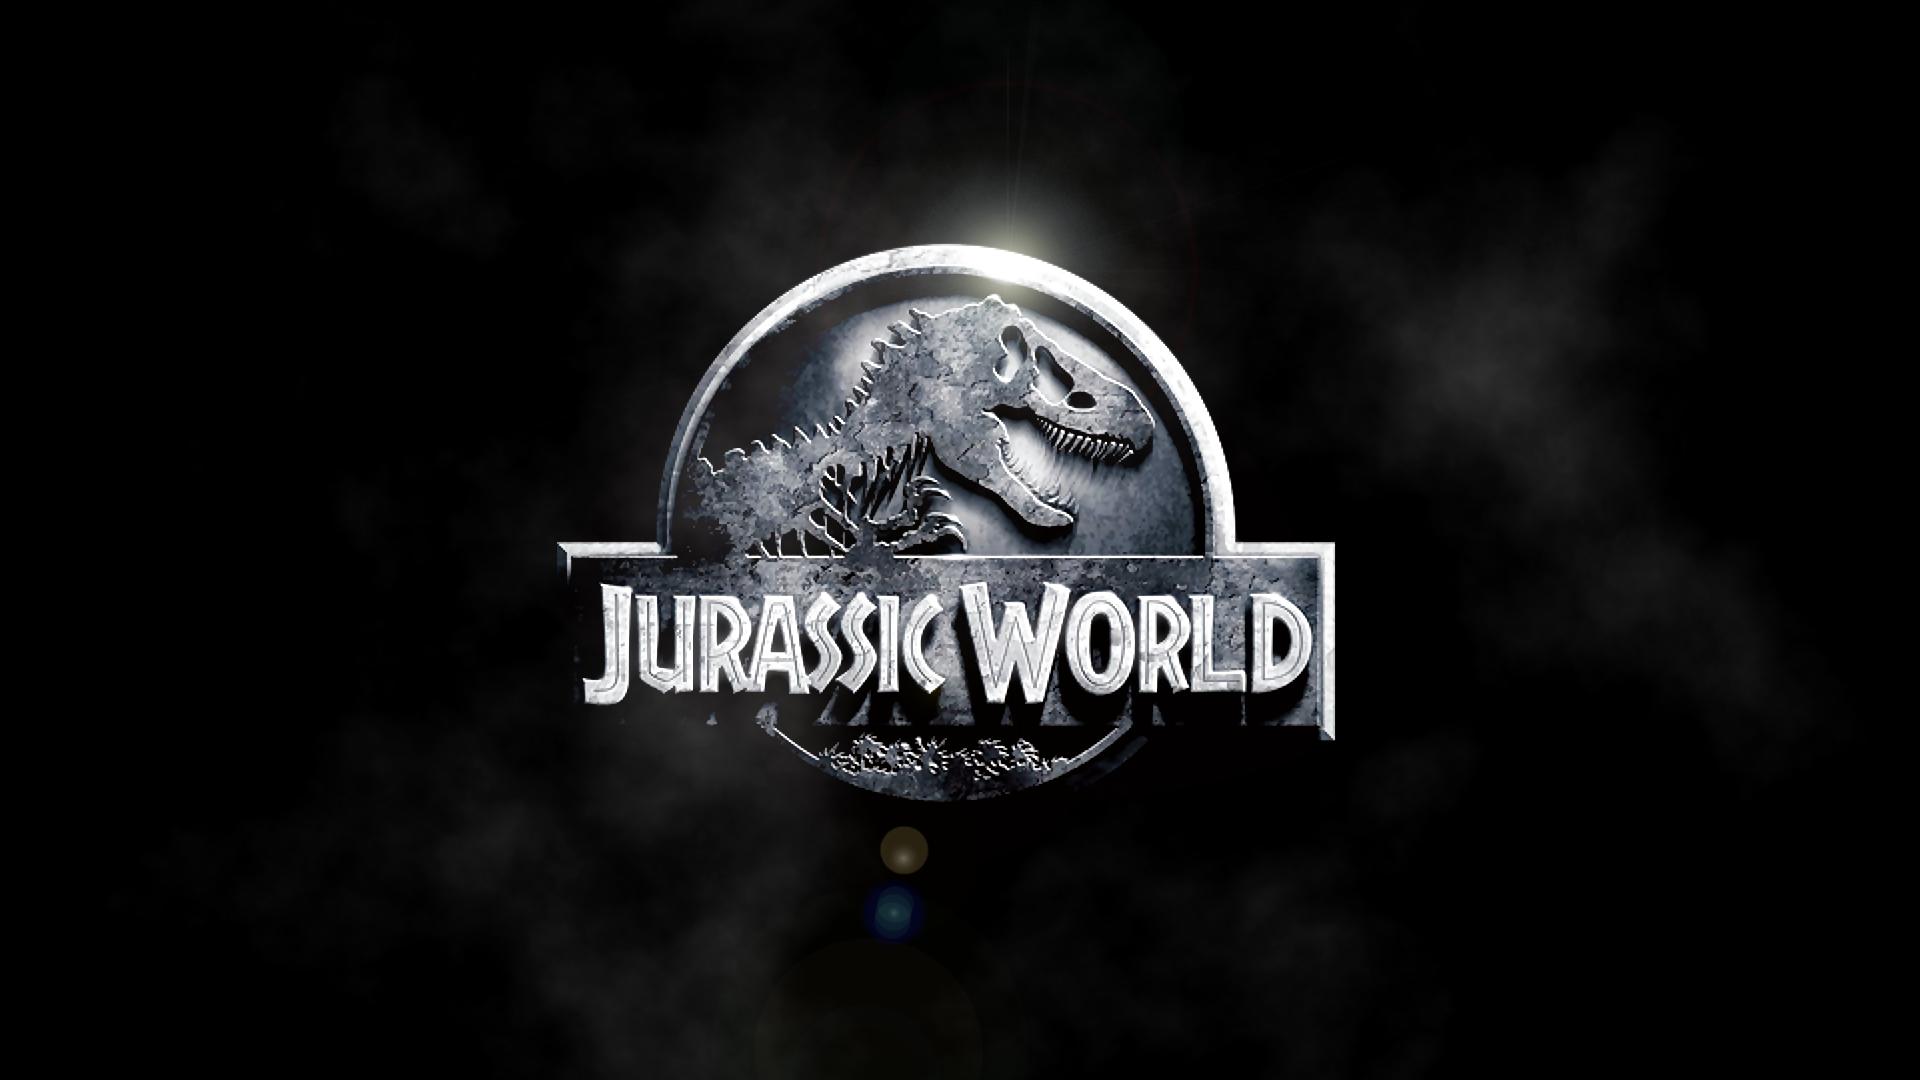 Jurassic park card 3 by chicagocubsfan24 on deviantart - Vcworks 21 3 Jurassic World By Professoradagio